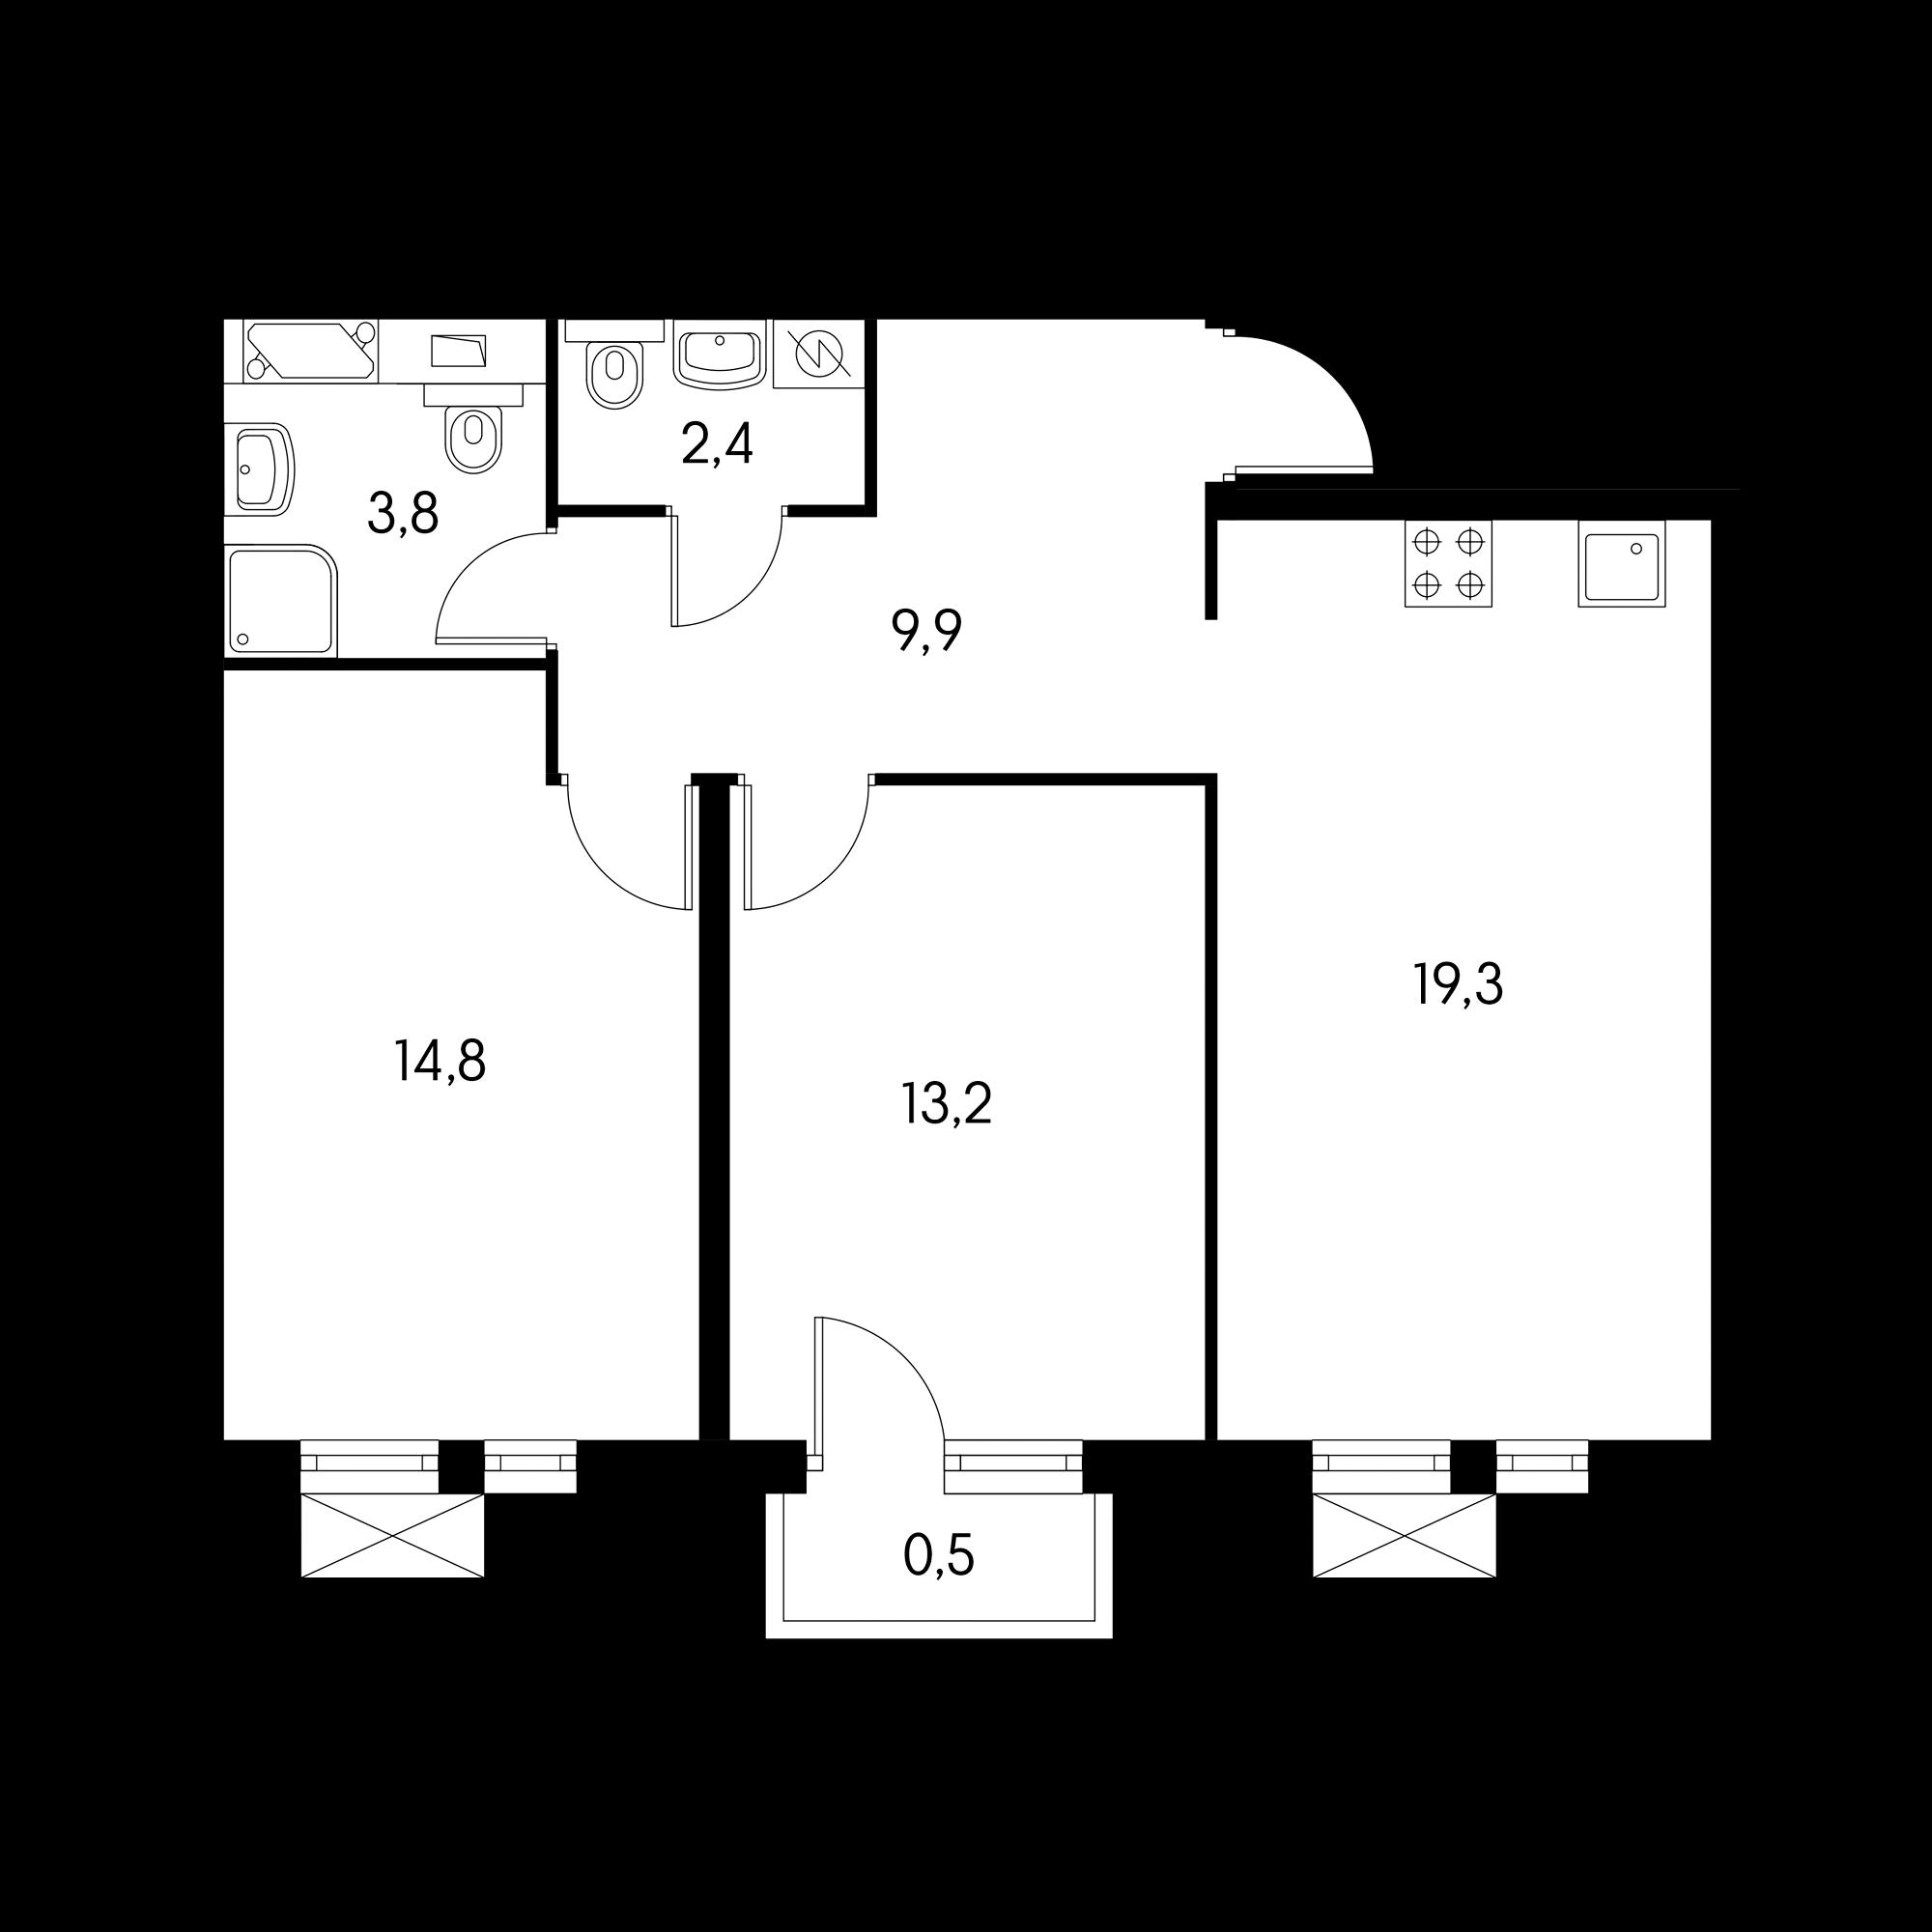 2-2(3)